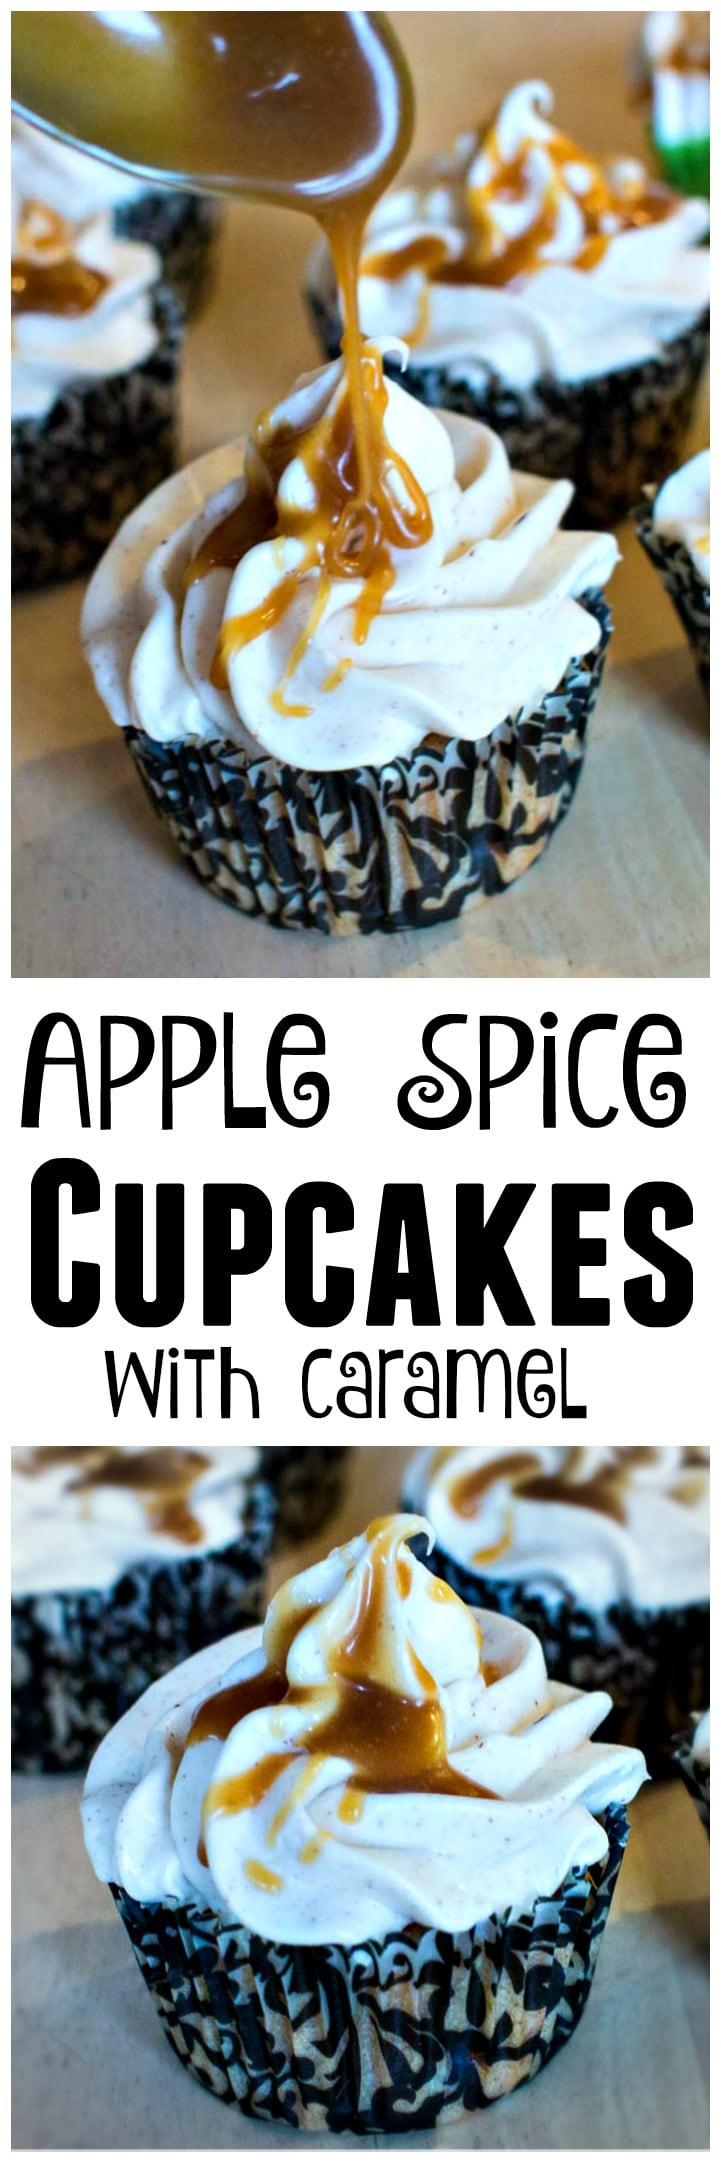 Apple Spice Cupcakes with Caramel Sauce | Caramel Apple Cupcakes | Spiced Apple Cupcakes | Caramel Sauce | Carmel Sauce | Gooey Caramel Cupcakes